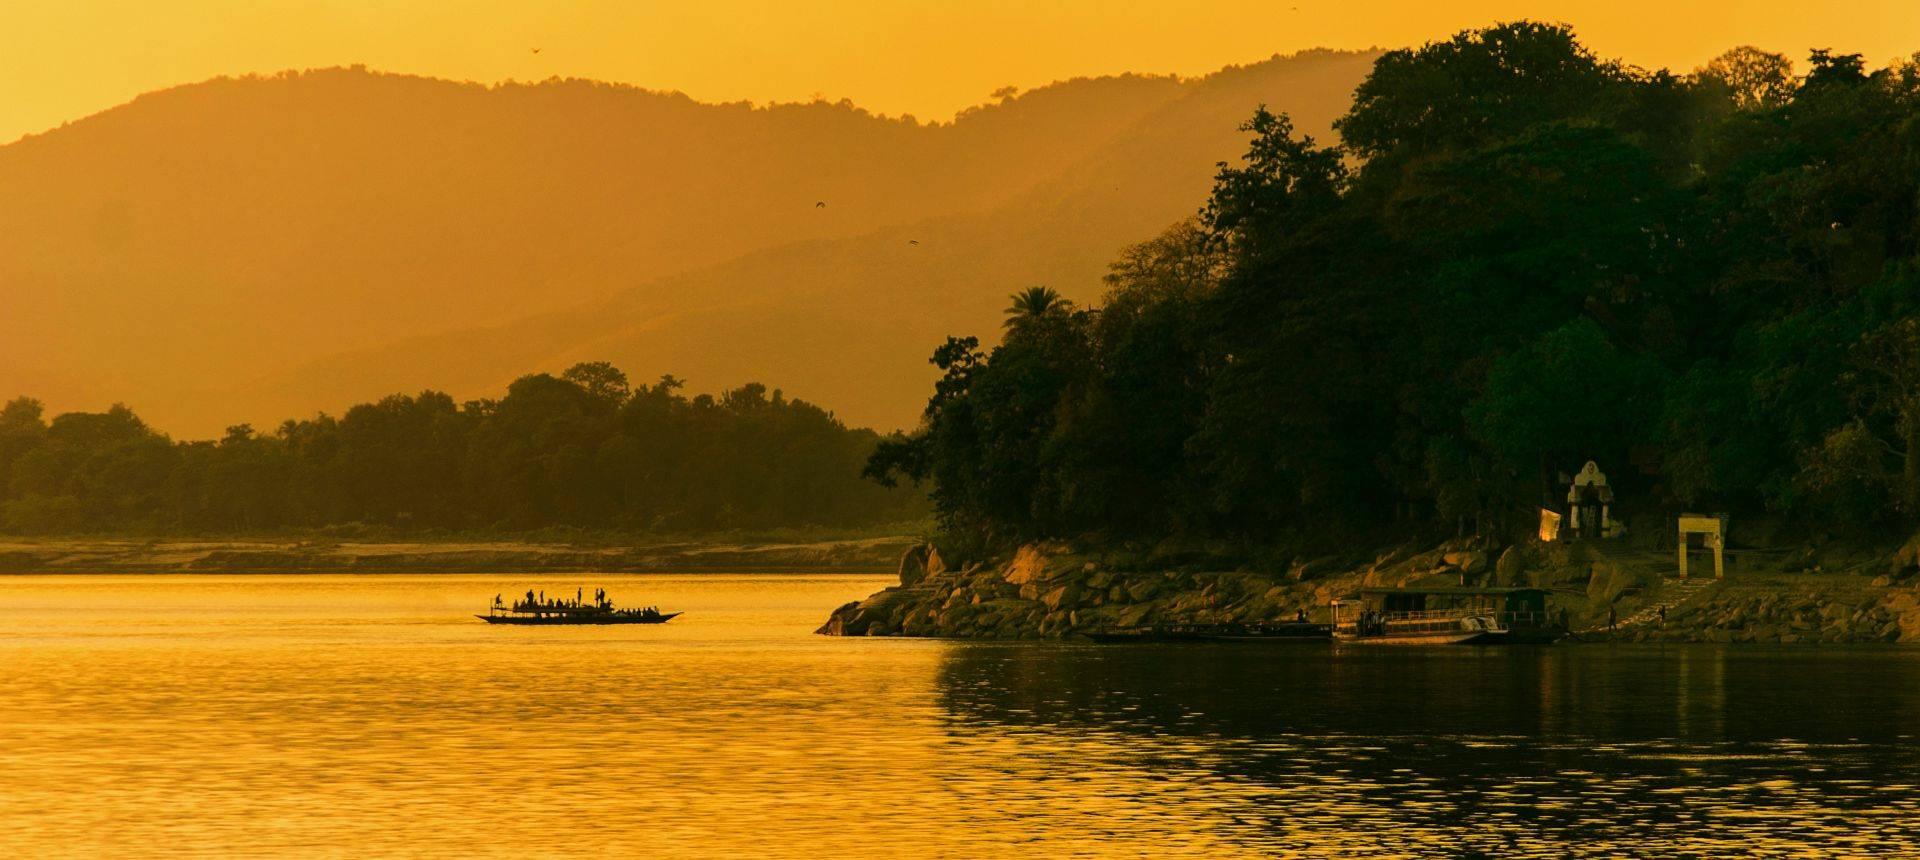 Brahmaputra River, Indiashutterstock 778182055